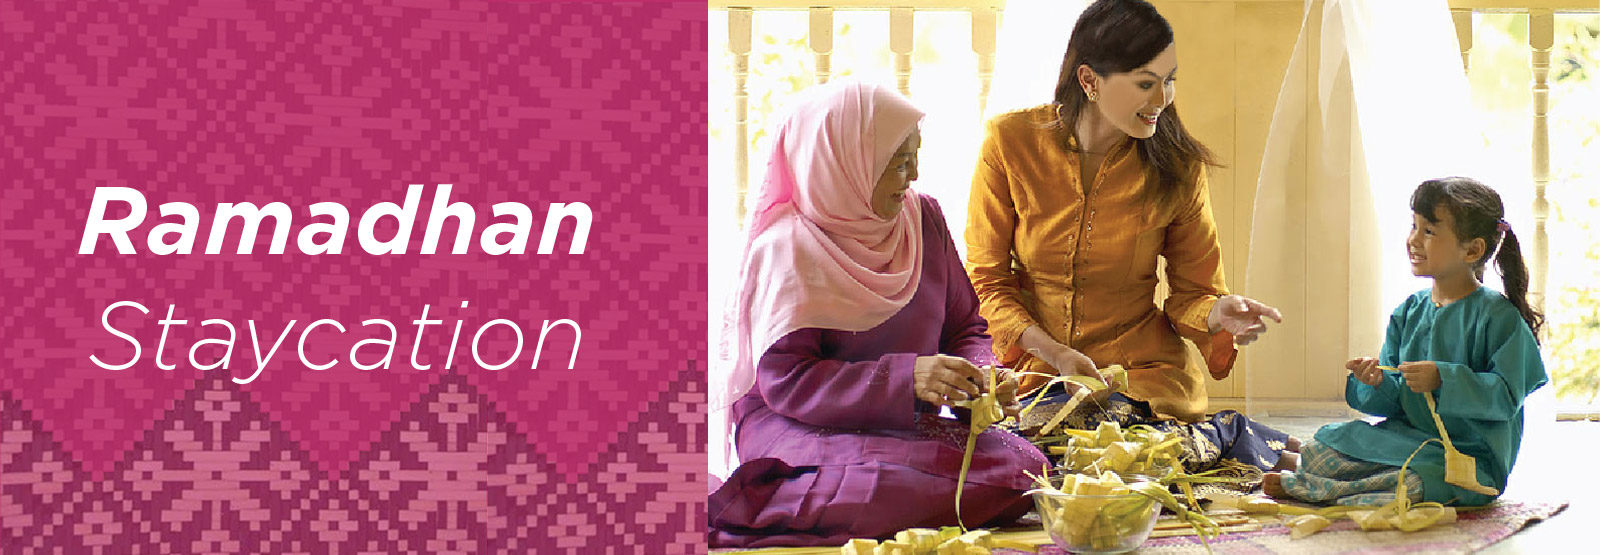 Ramadan Staycation